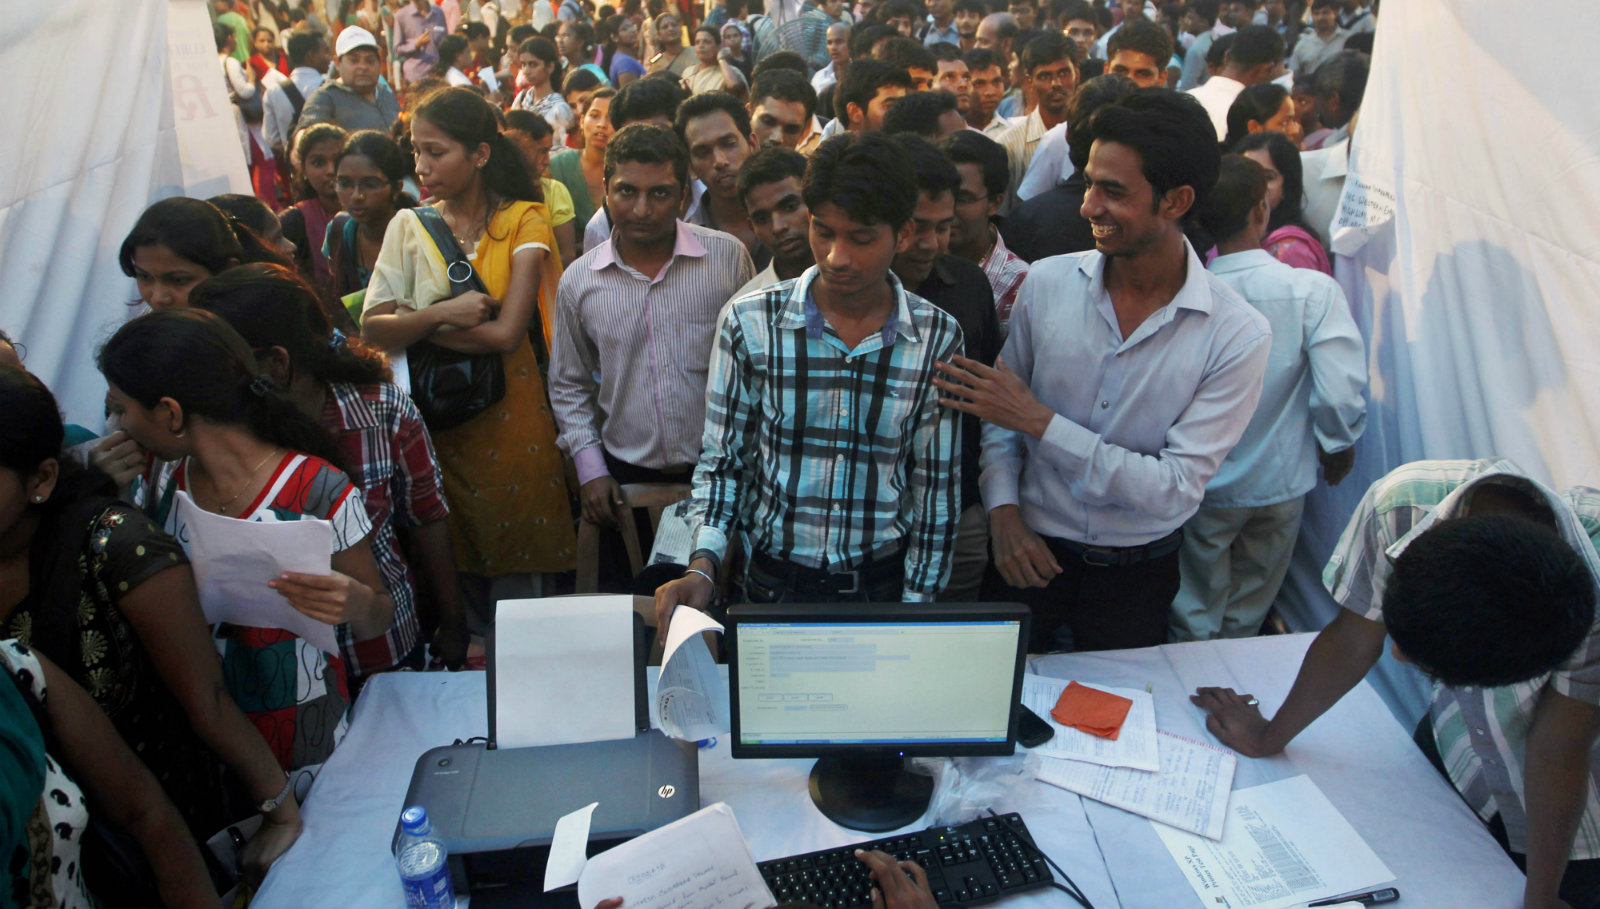 Indian youths seeking jobs crowd a job fair in Mumbai, India, Wednesday, Oct. 12, 2011.